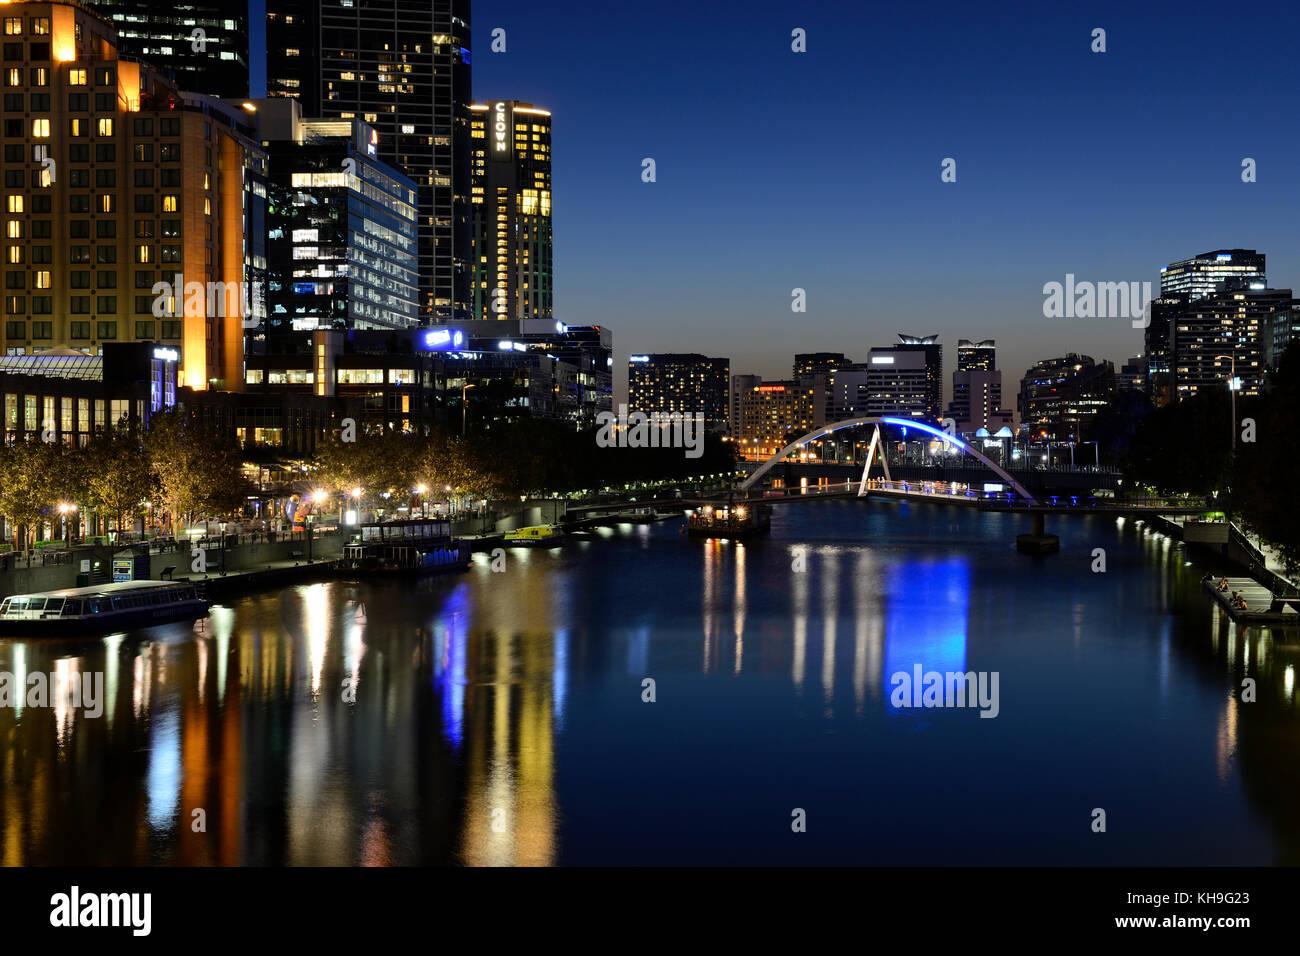 Southbank Precinct and Evan Walker Bridge on Yarra River by night - Melbourne, Victoria, Australia - Stock Image